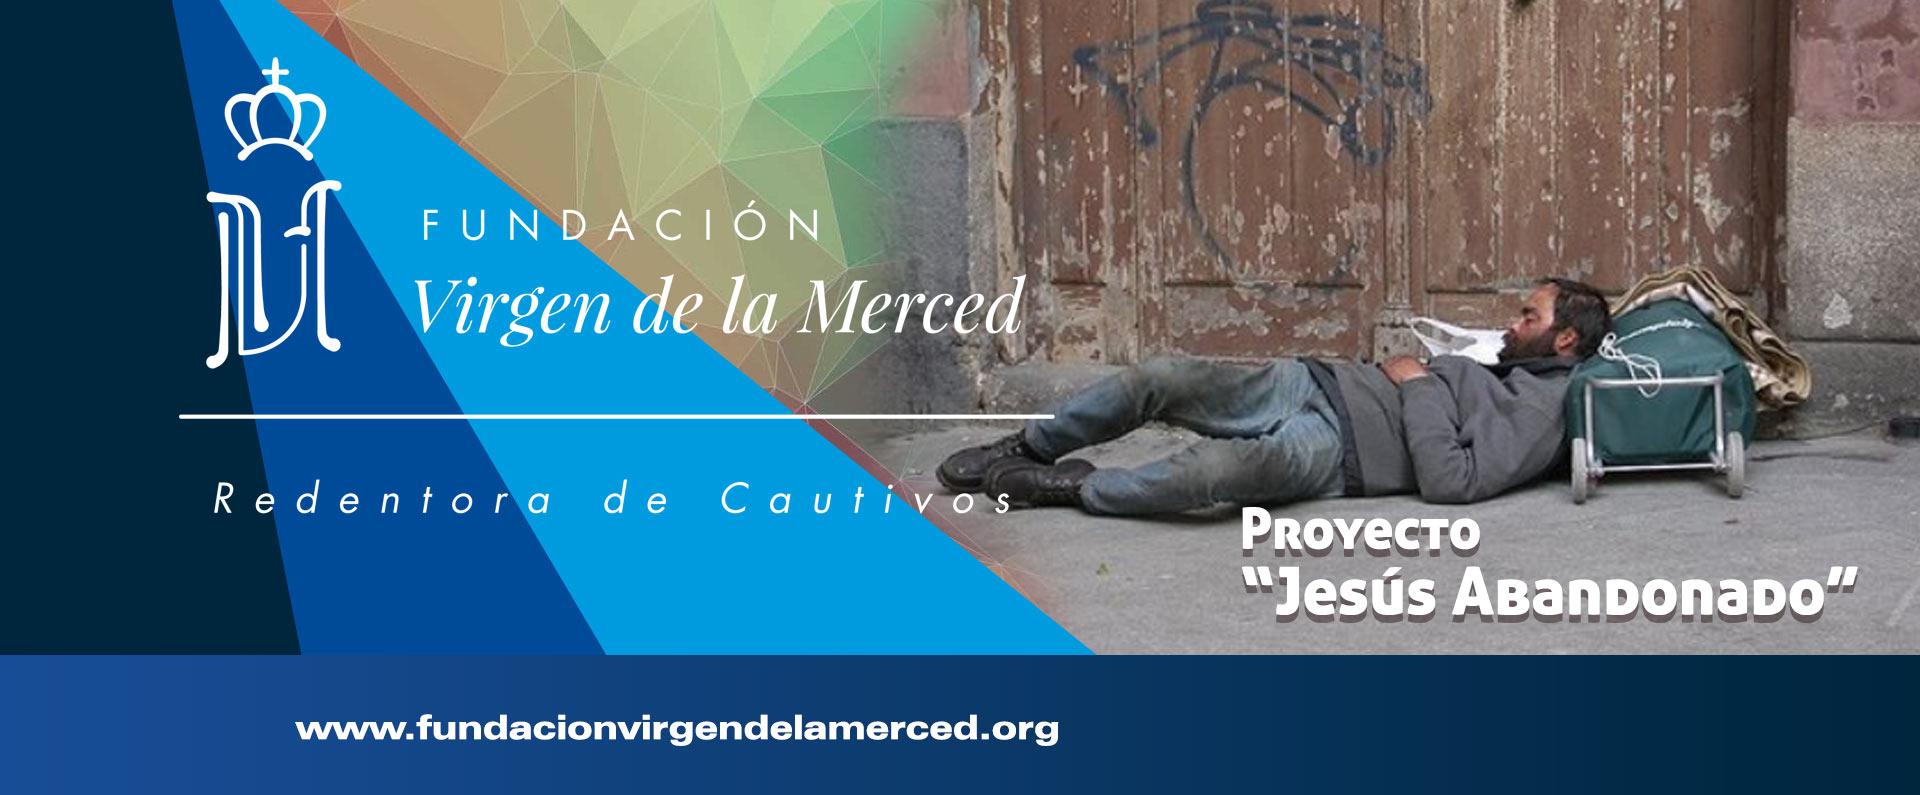 proyecto jesus abandonado